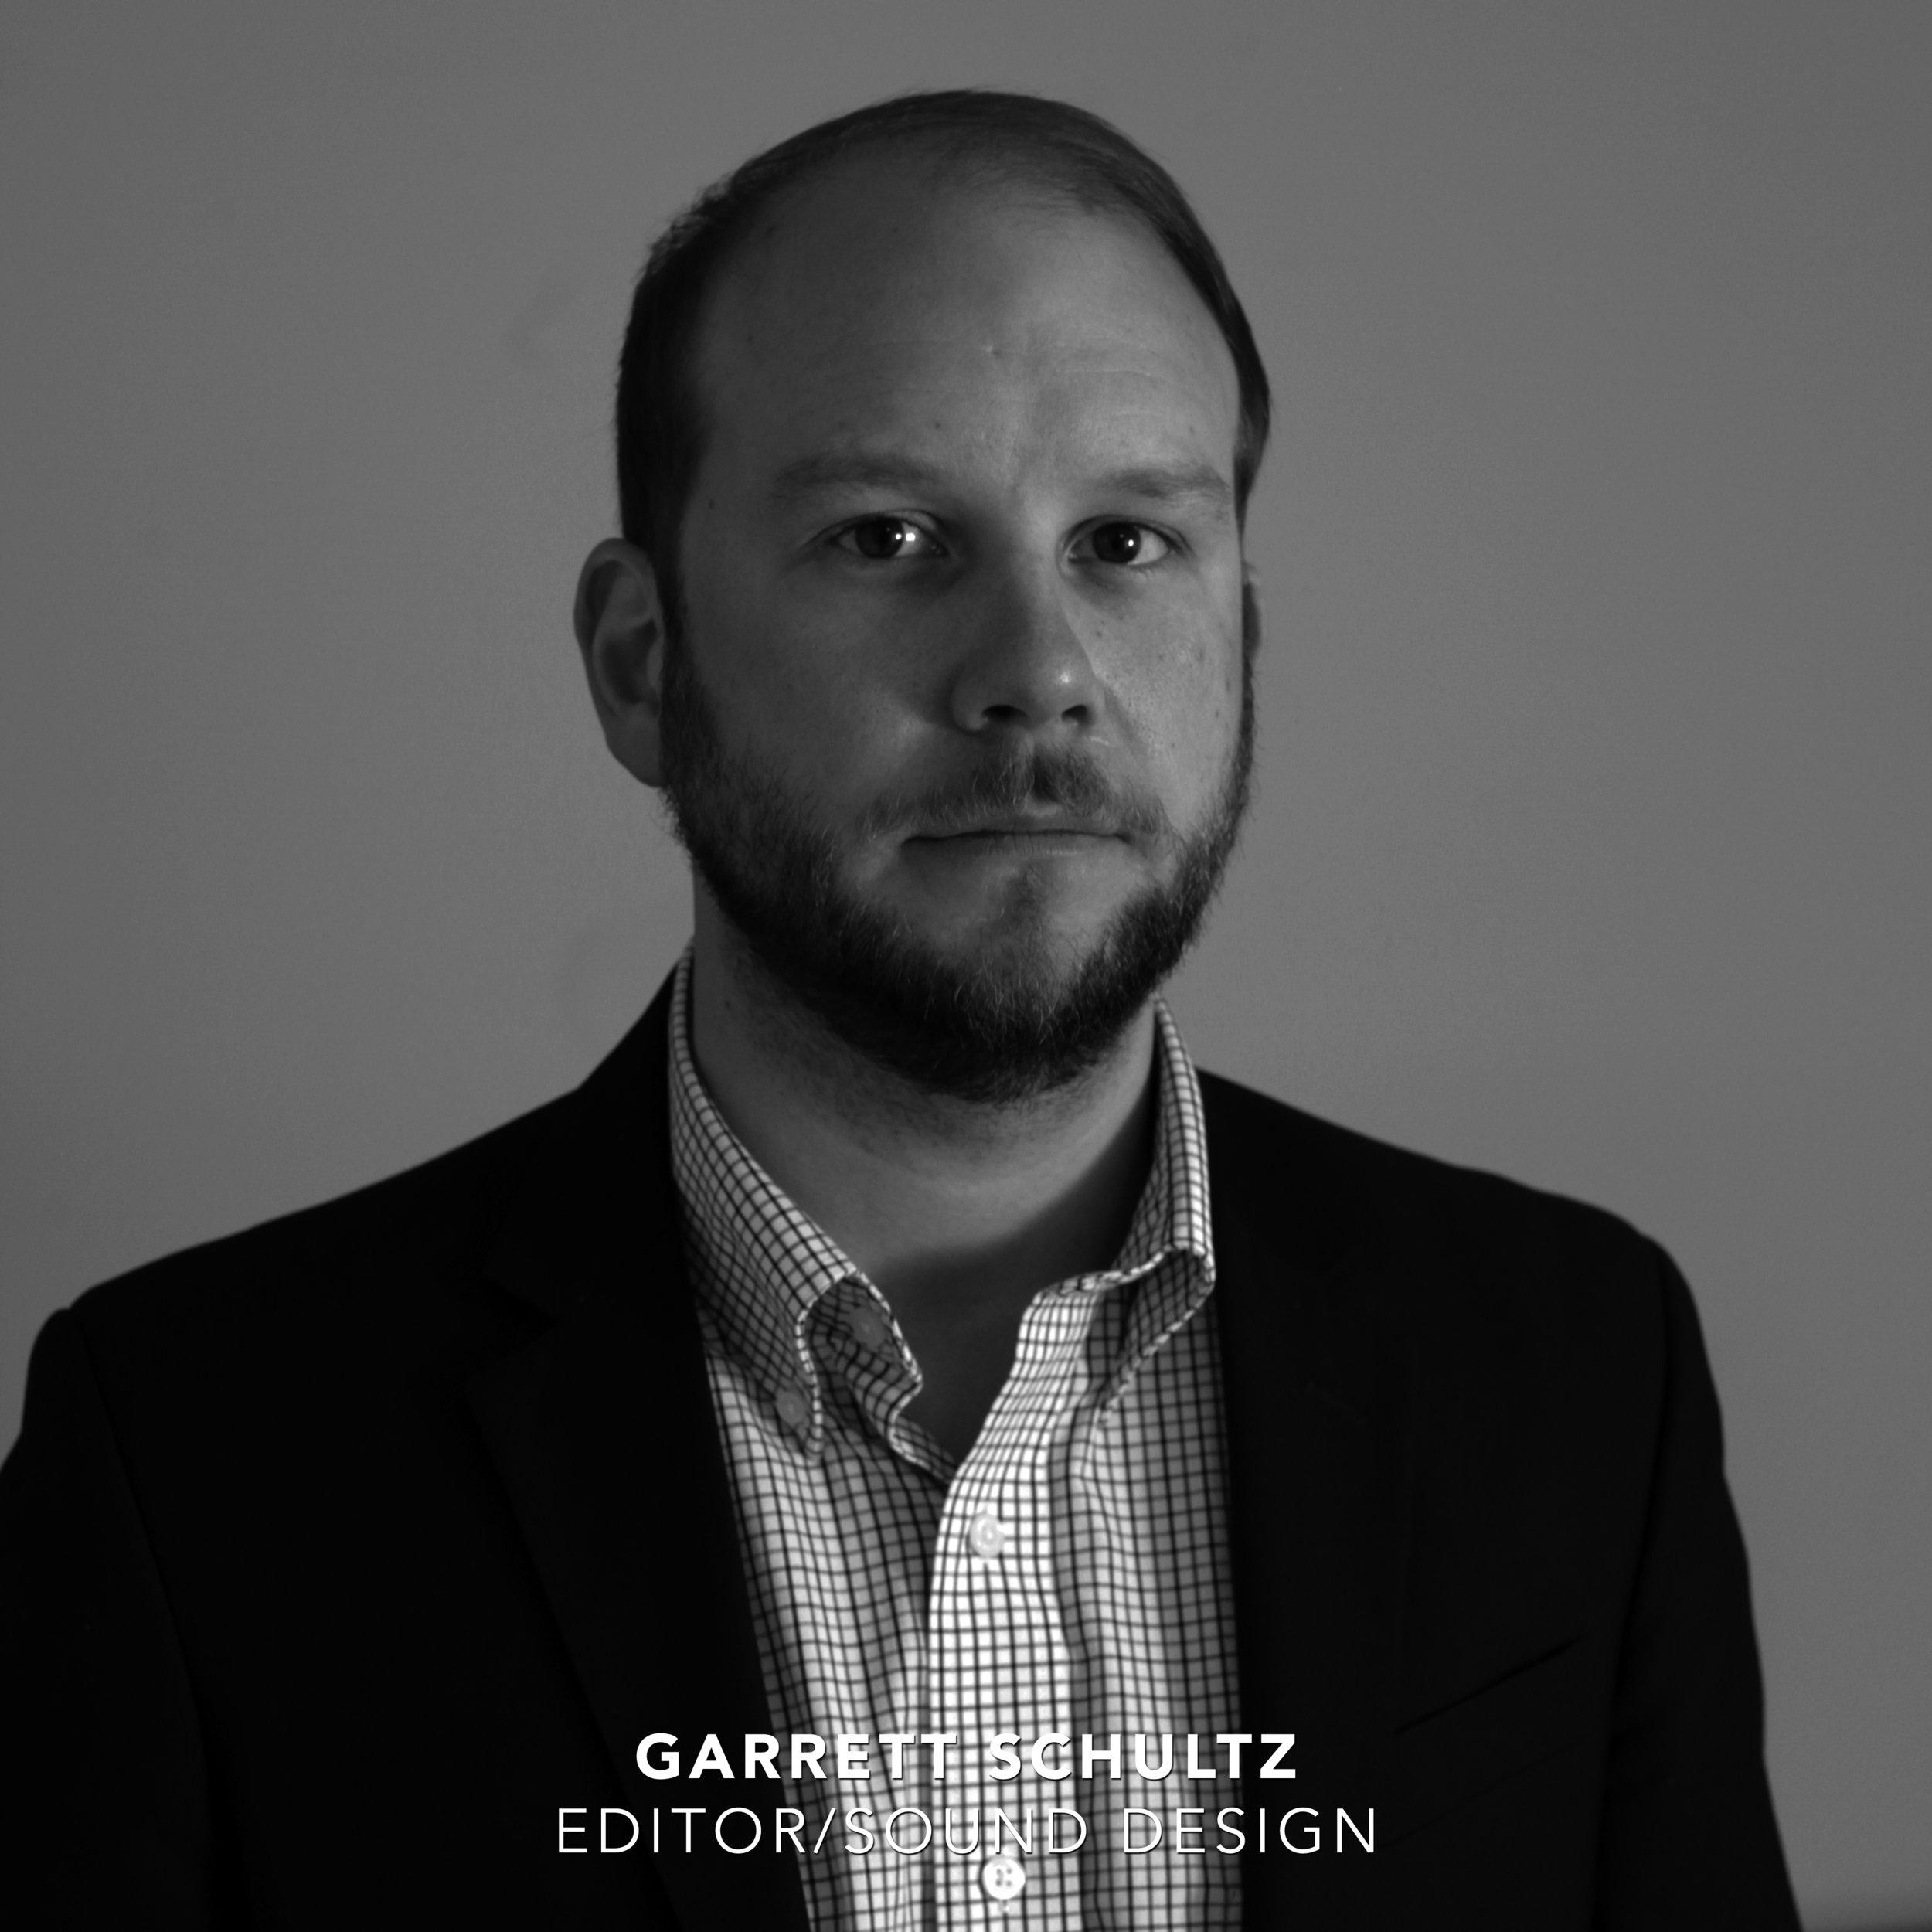 Garrett Headshot copy.jpg